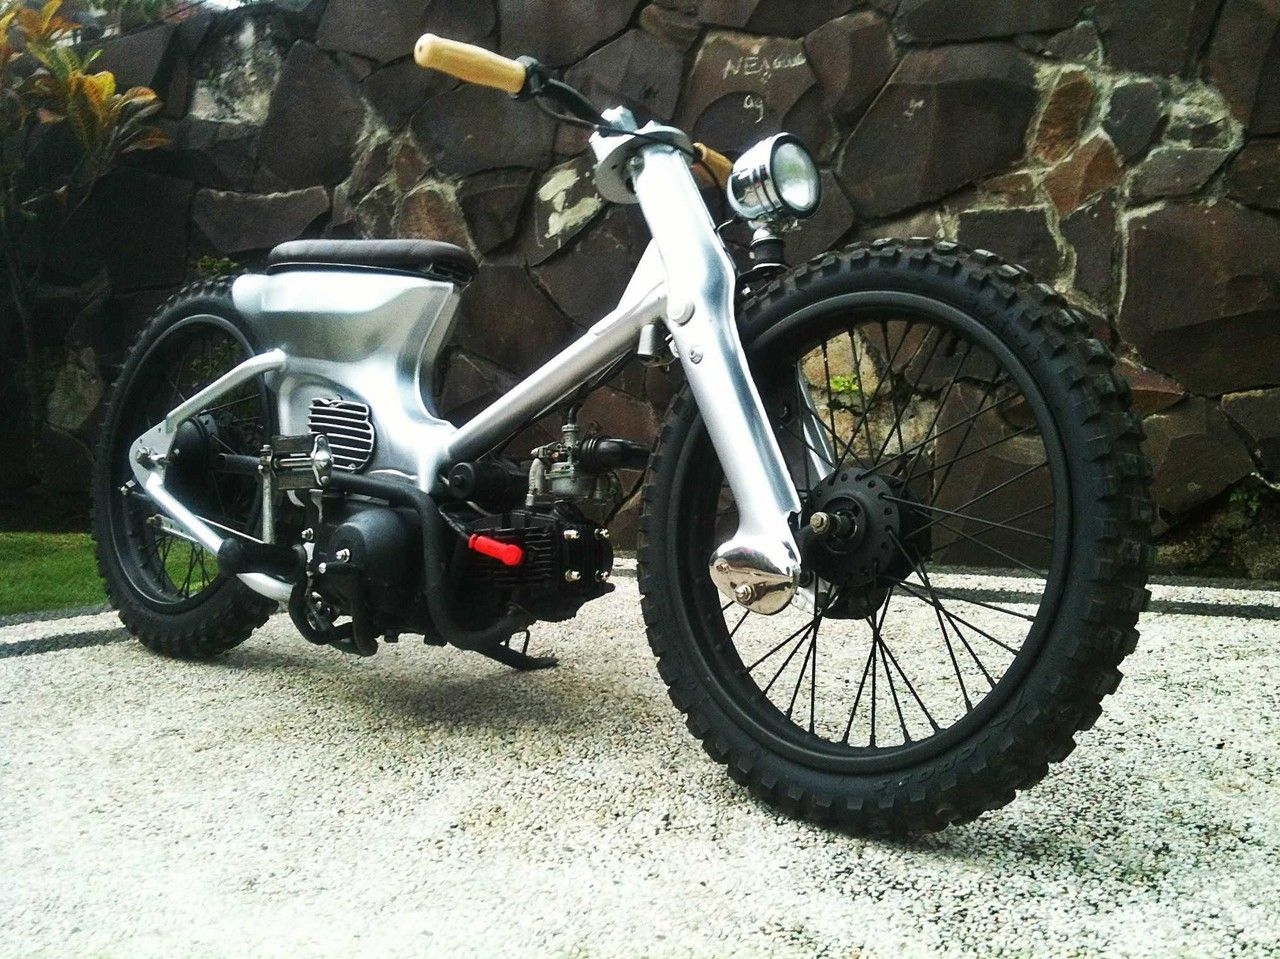 Honda C90 Bobber Marco Rgido Motorcycles ATVs Pinterest